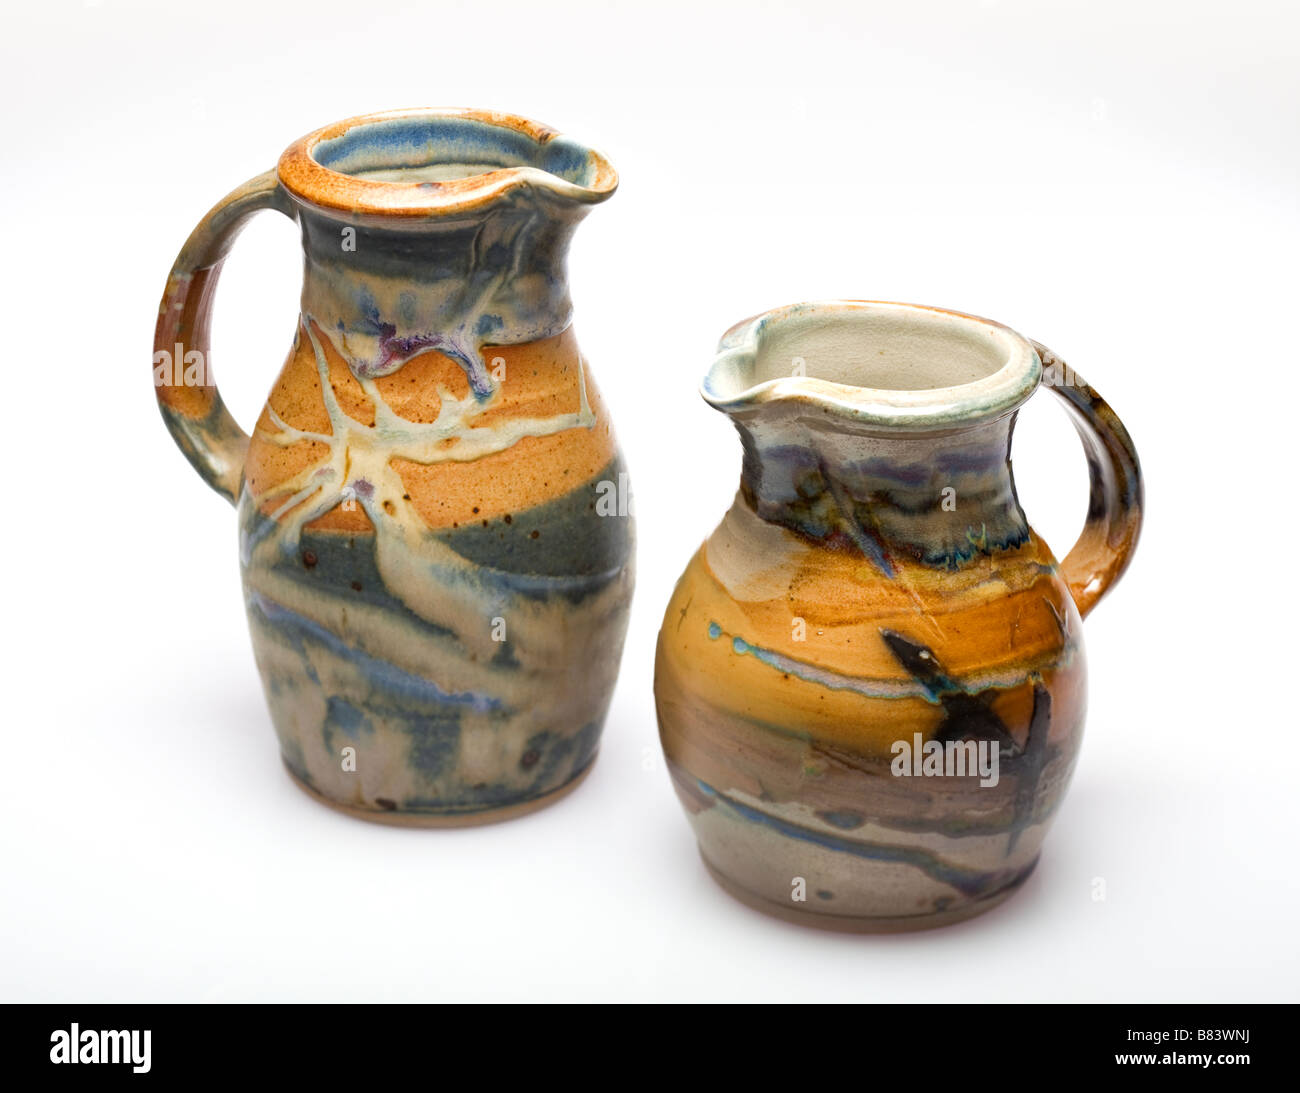 Two jugs made by the Edinbane pottery on the Isle of Skye Scotland UK - Stock Image